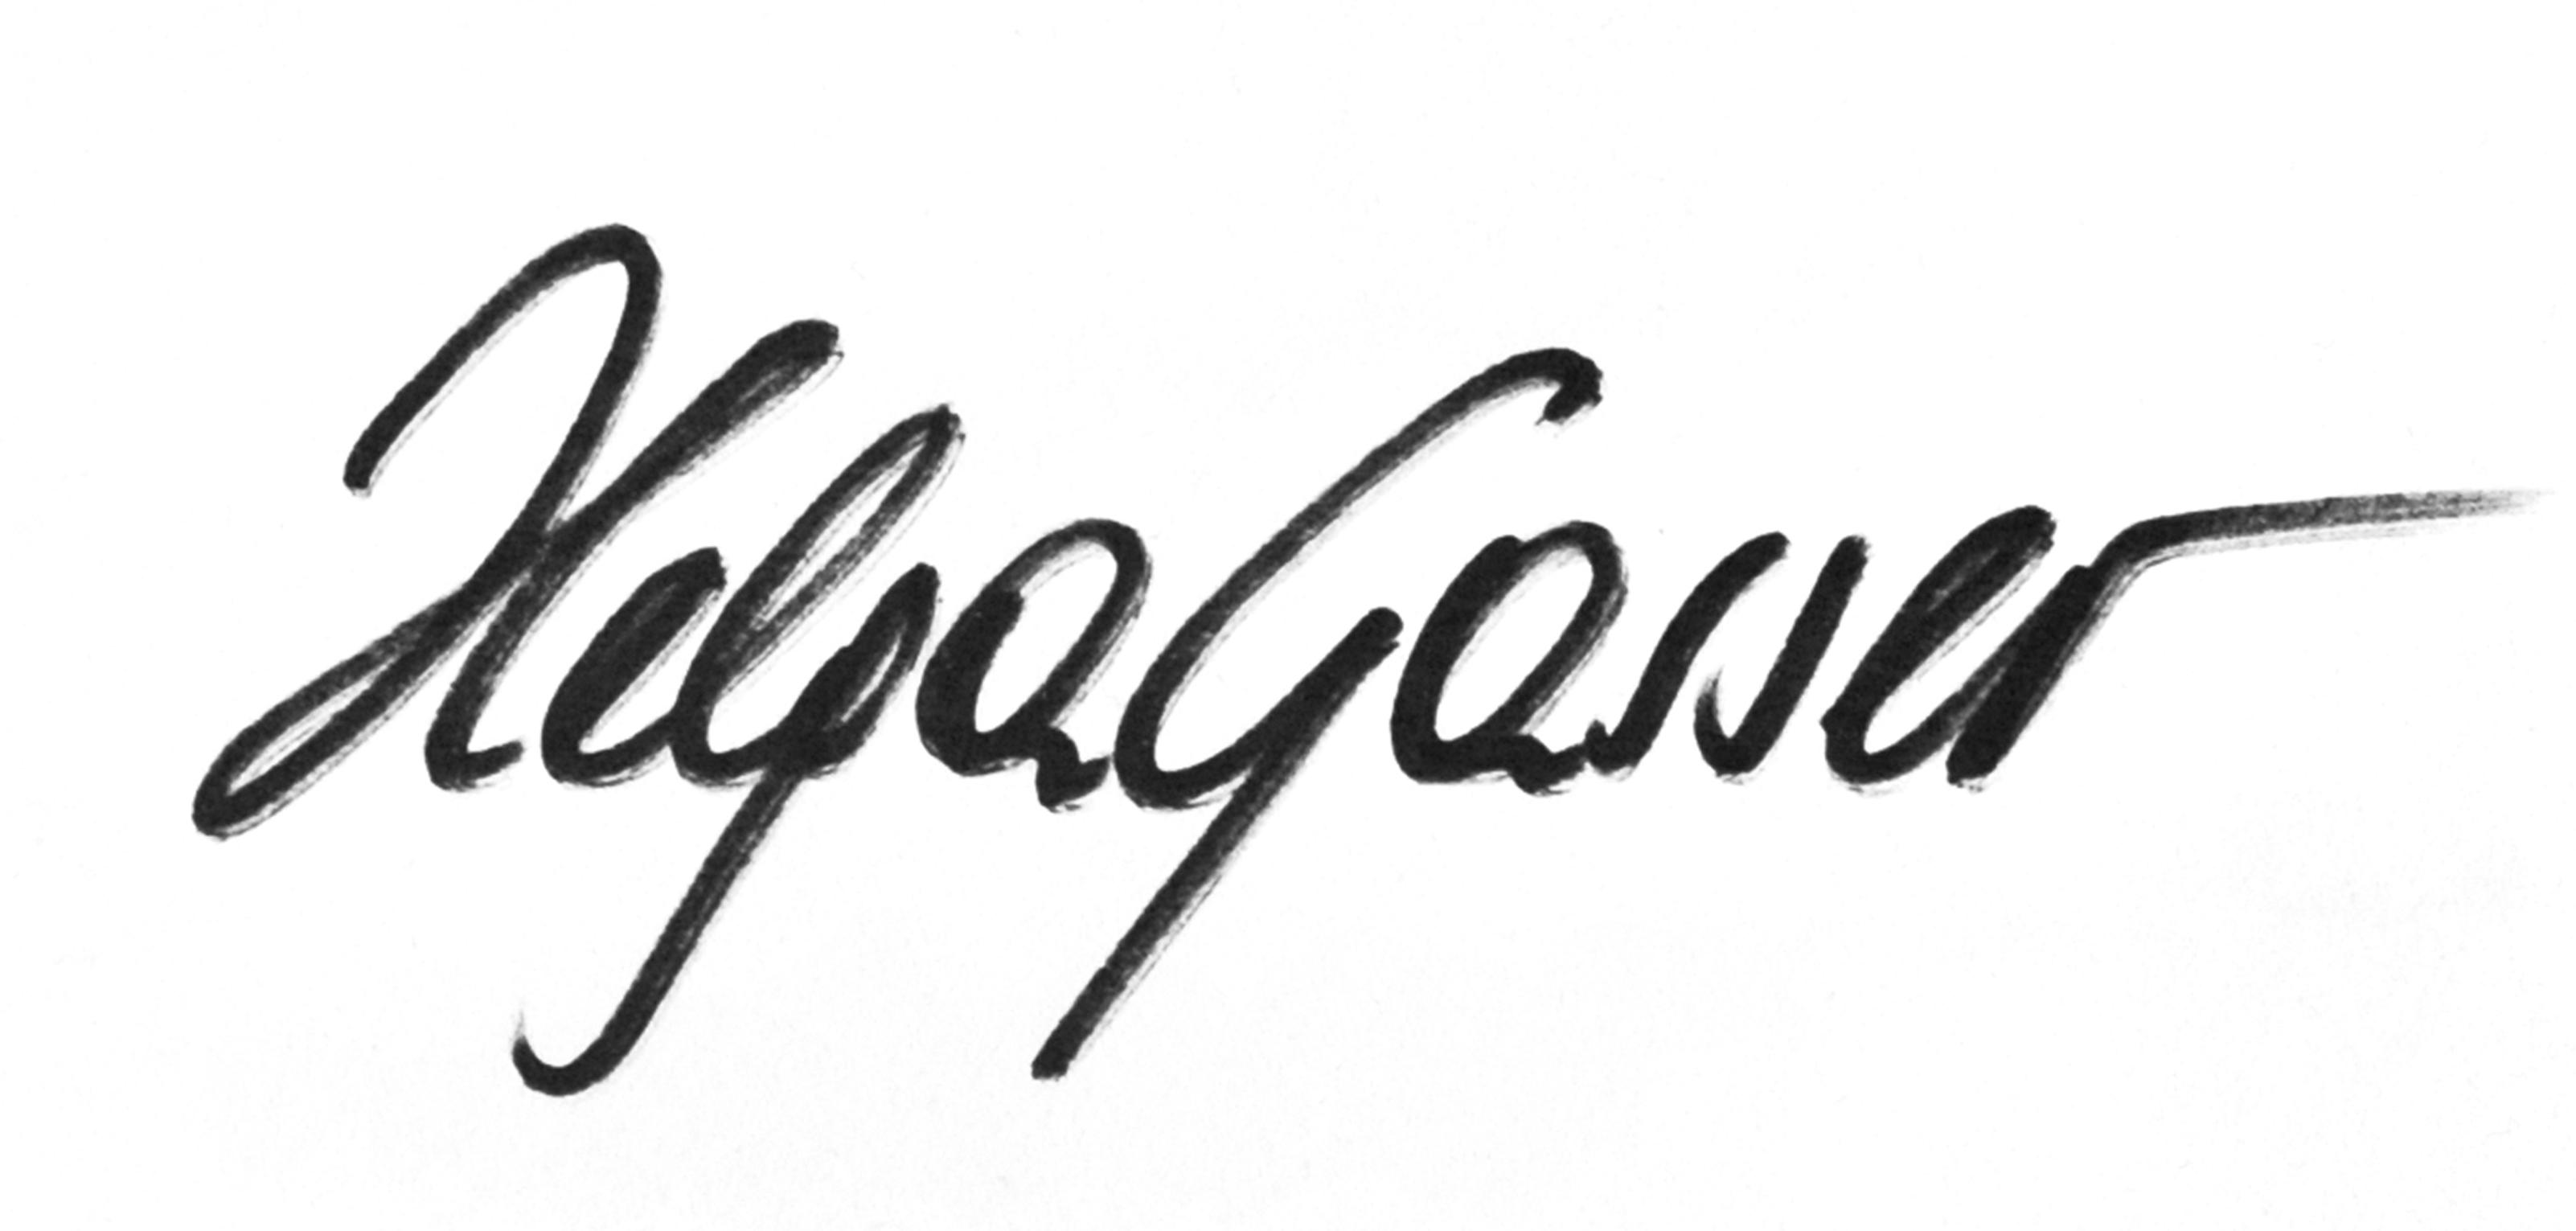 Helga Gasser Signature